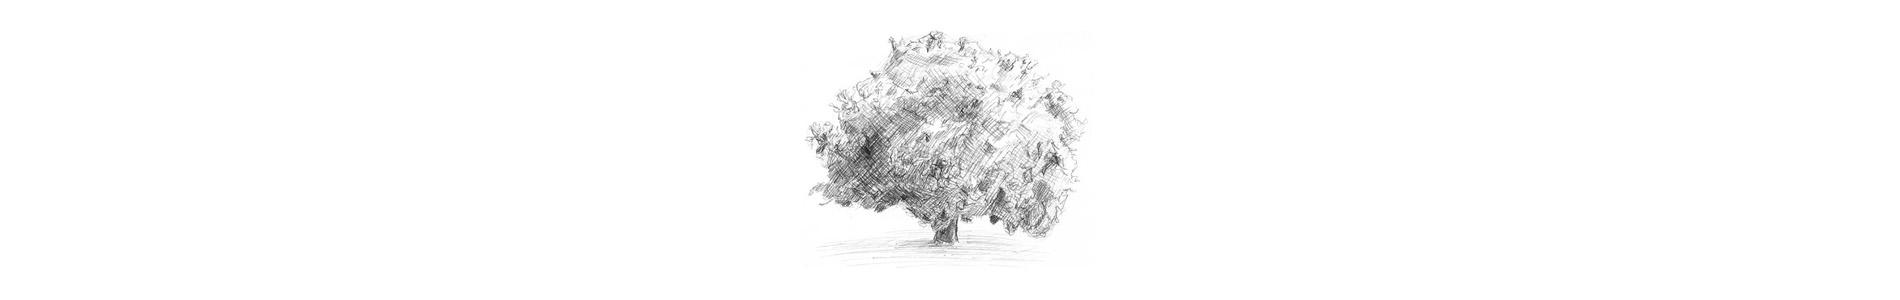 tree-slider